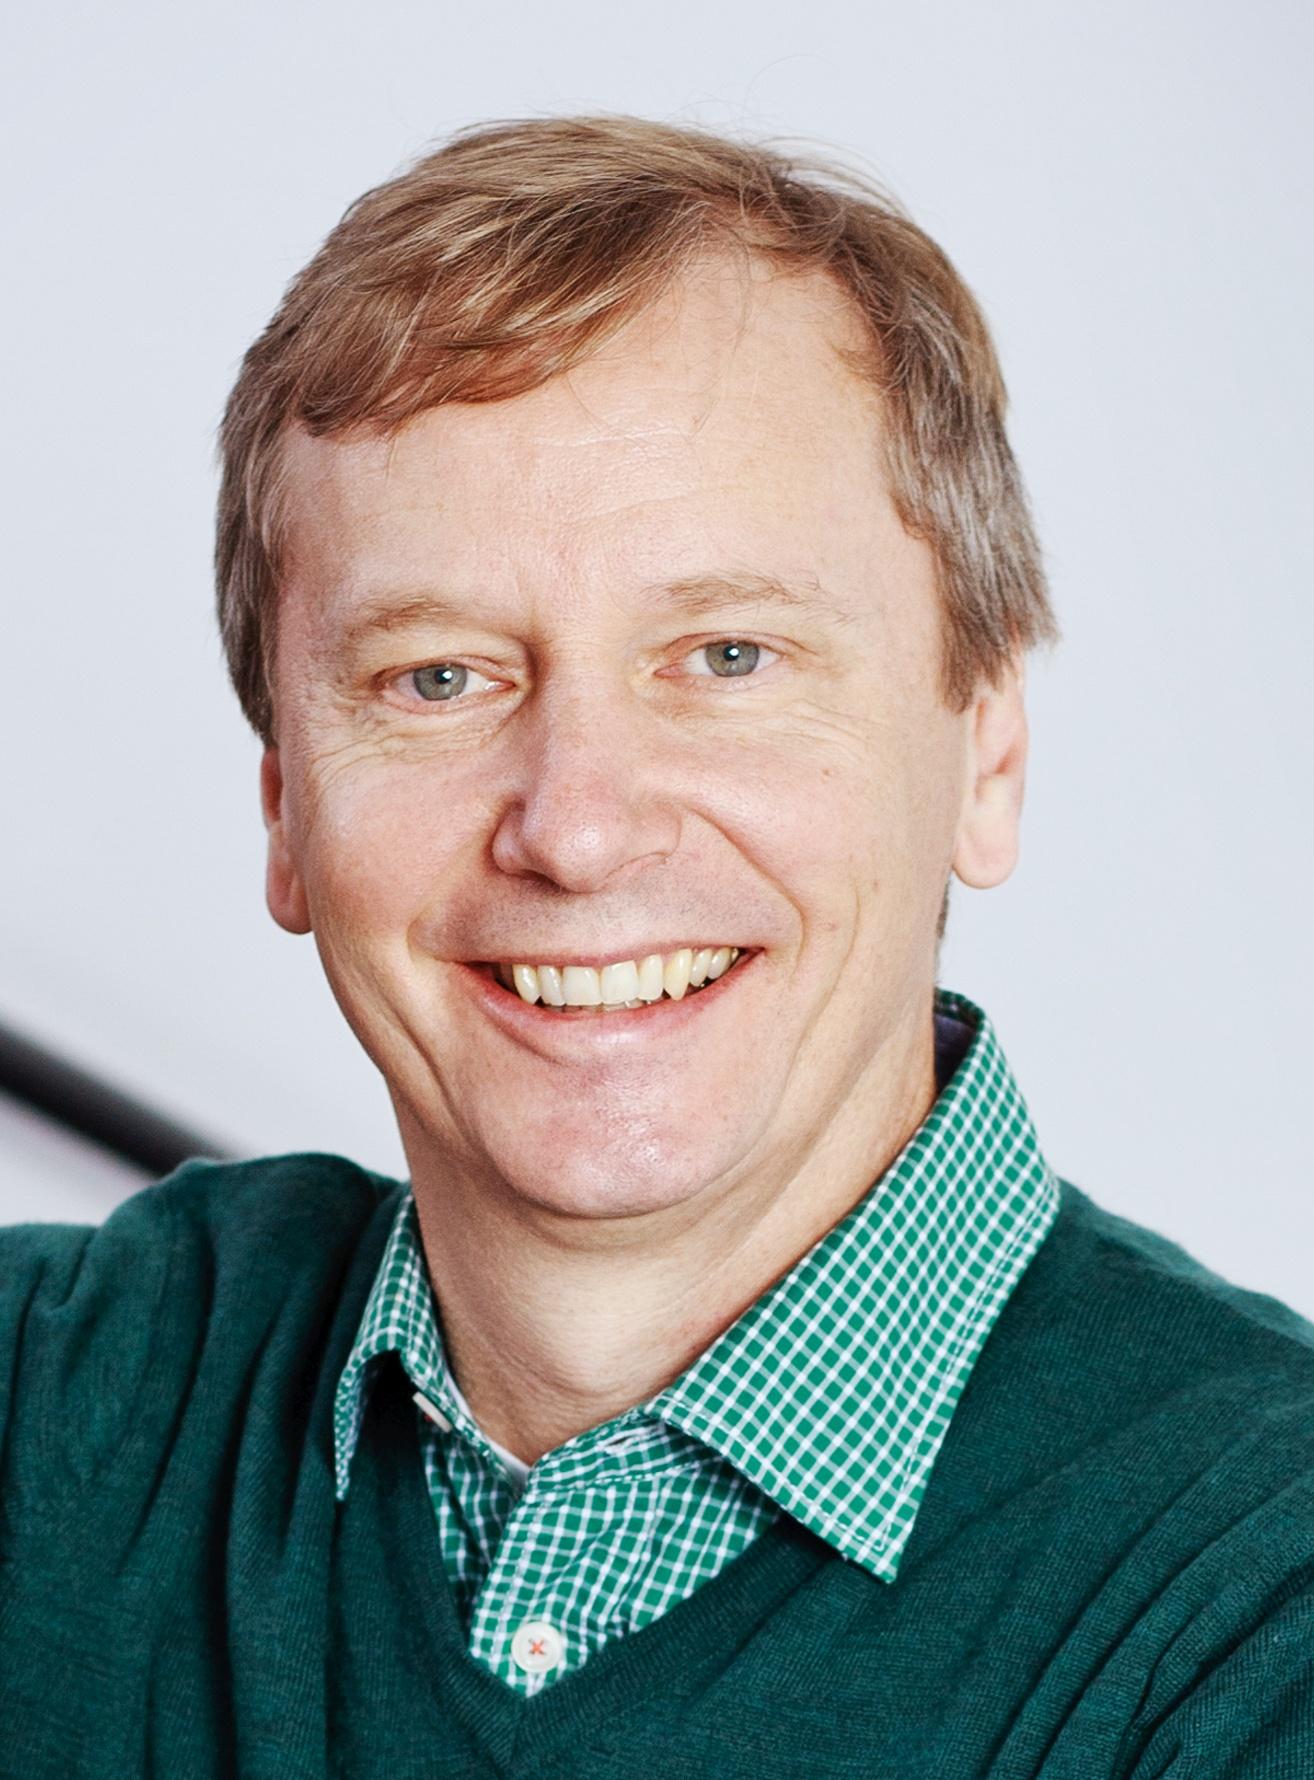 Gerhard Fettweis